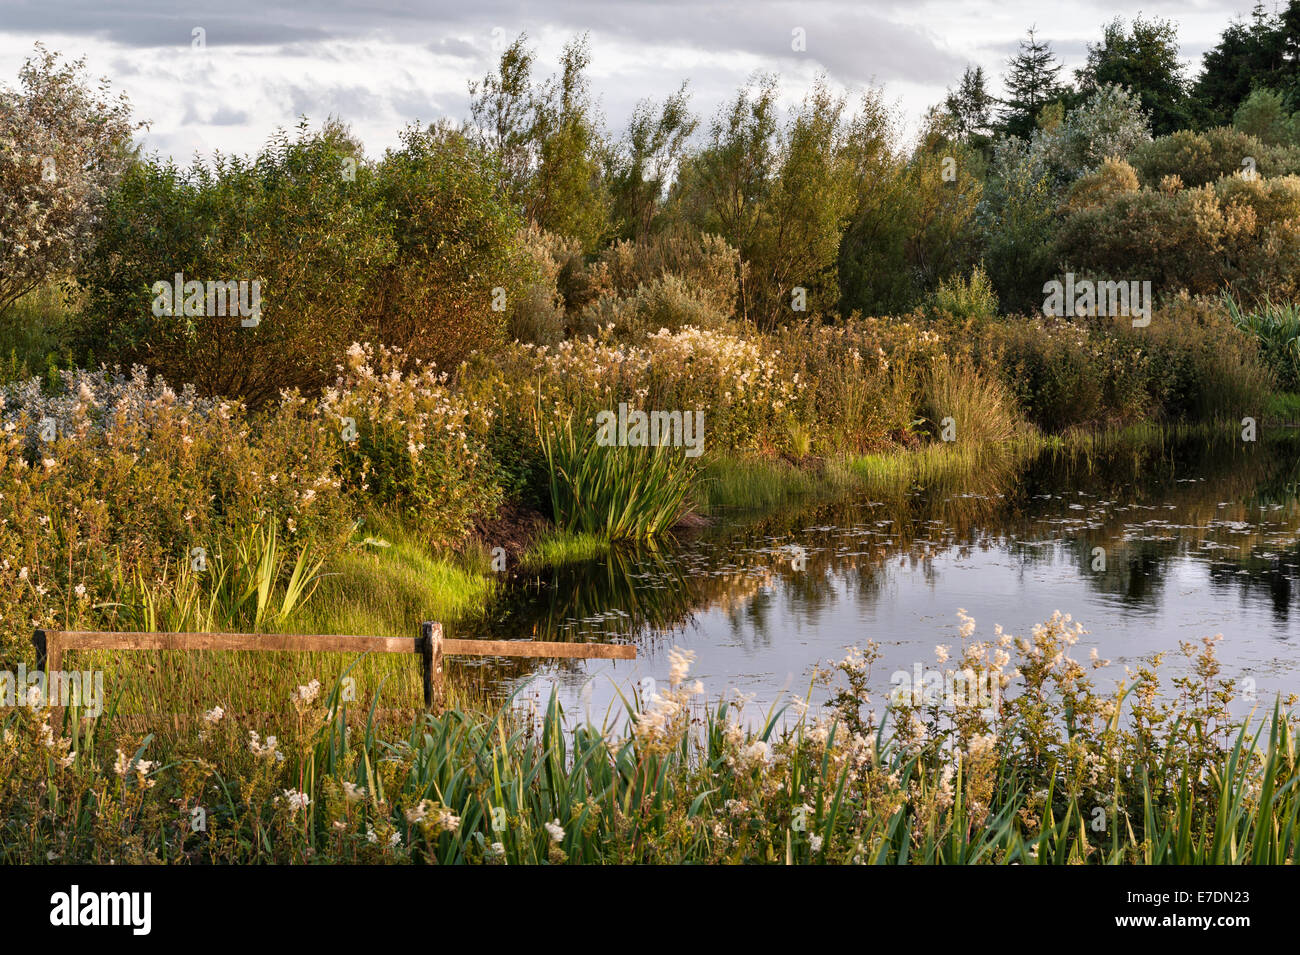 Little Sparta, Scotland. The garden created by the artist Ian Hamilton Finlay in the Pentland Hills. A corner of - Stock Image